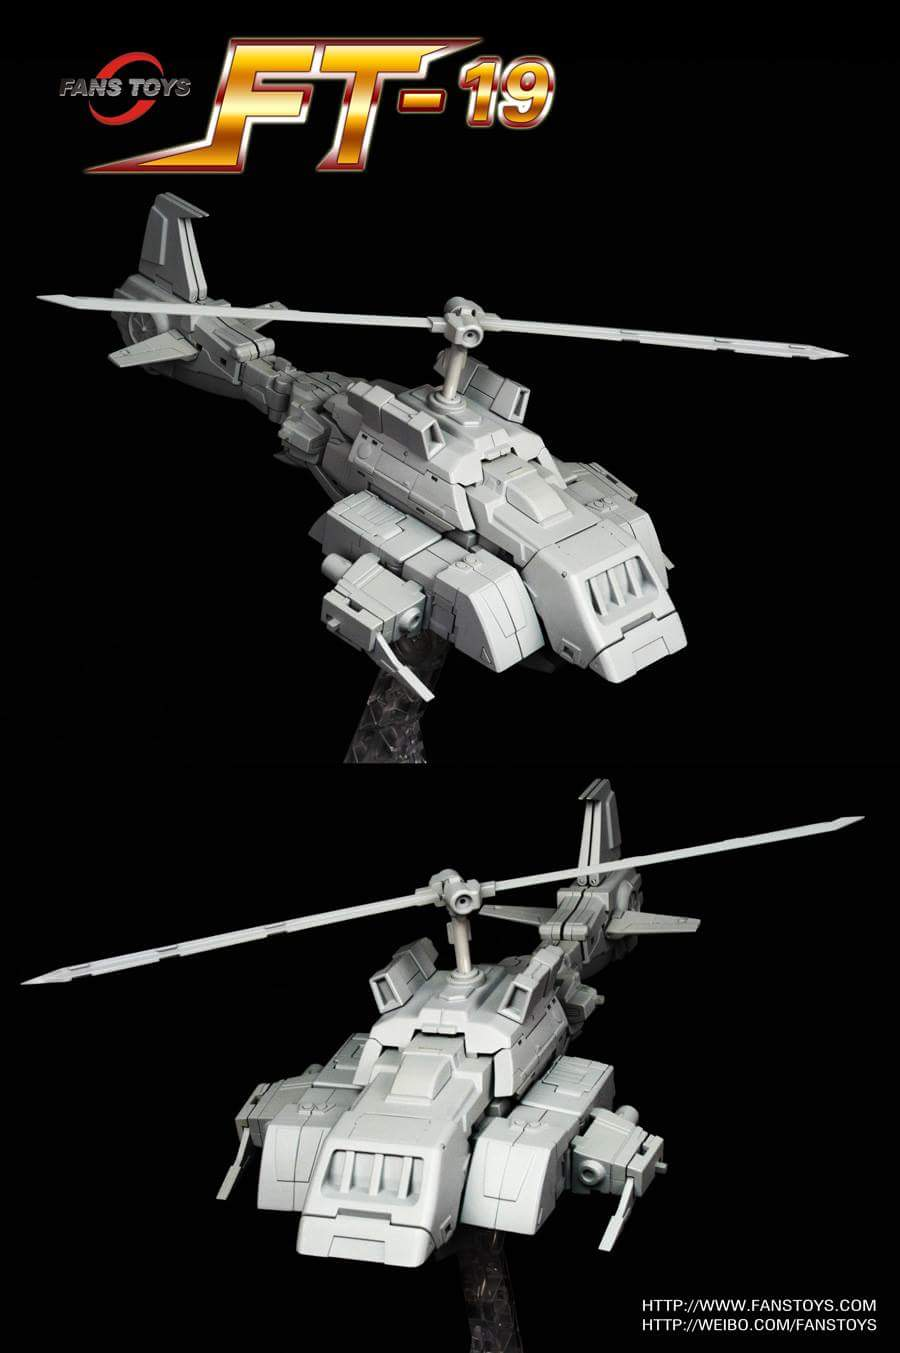 [Fanstoys] Produit Tiers - Jouet FT-19 Apache - aka Springer/Ricochet CkqesUQI